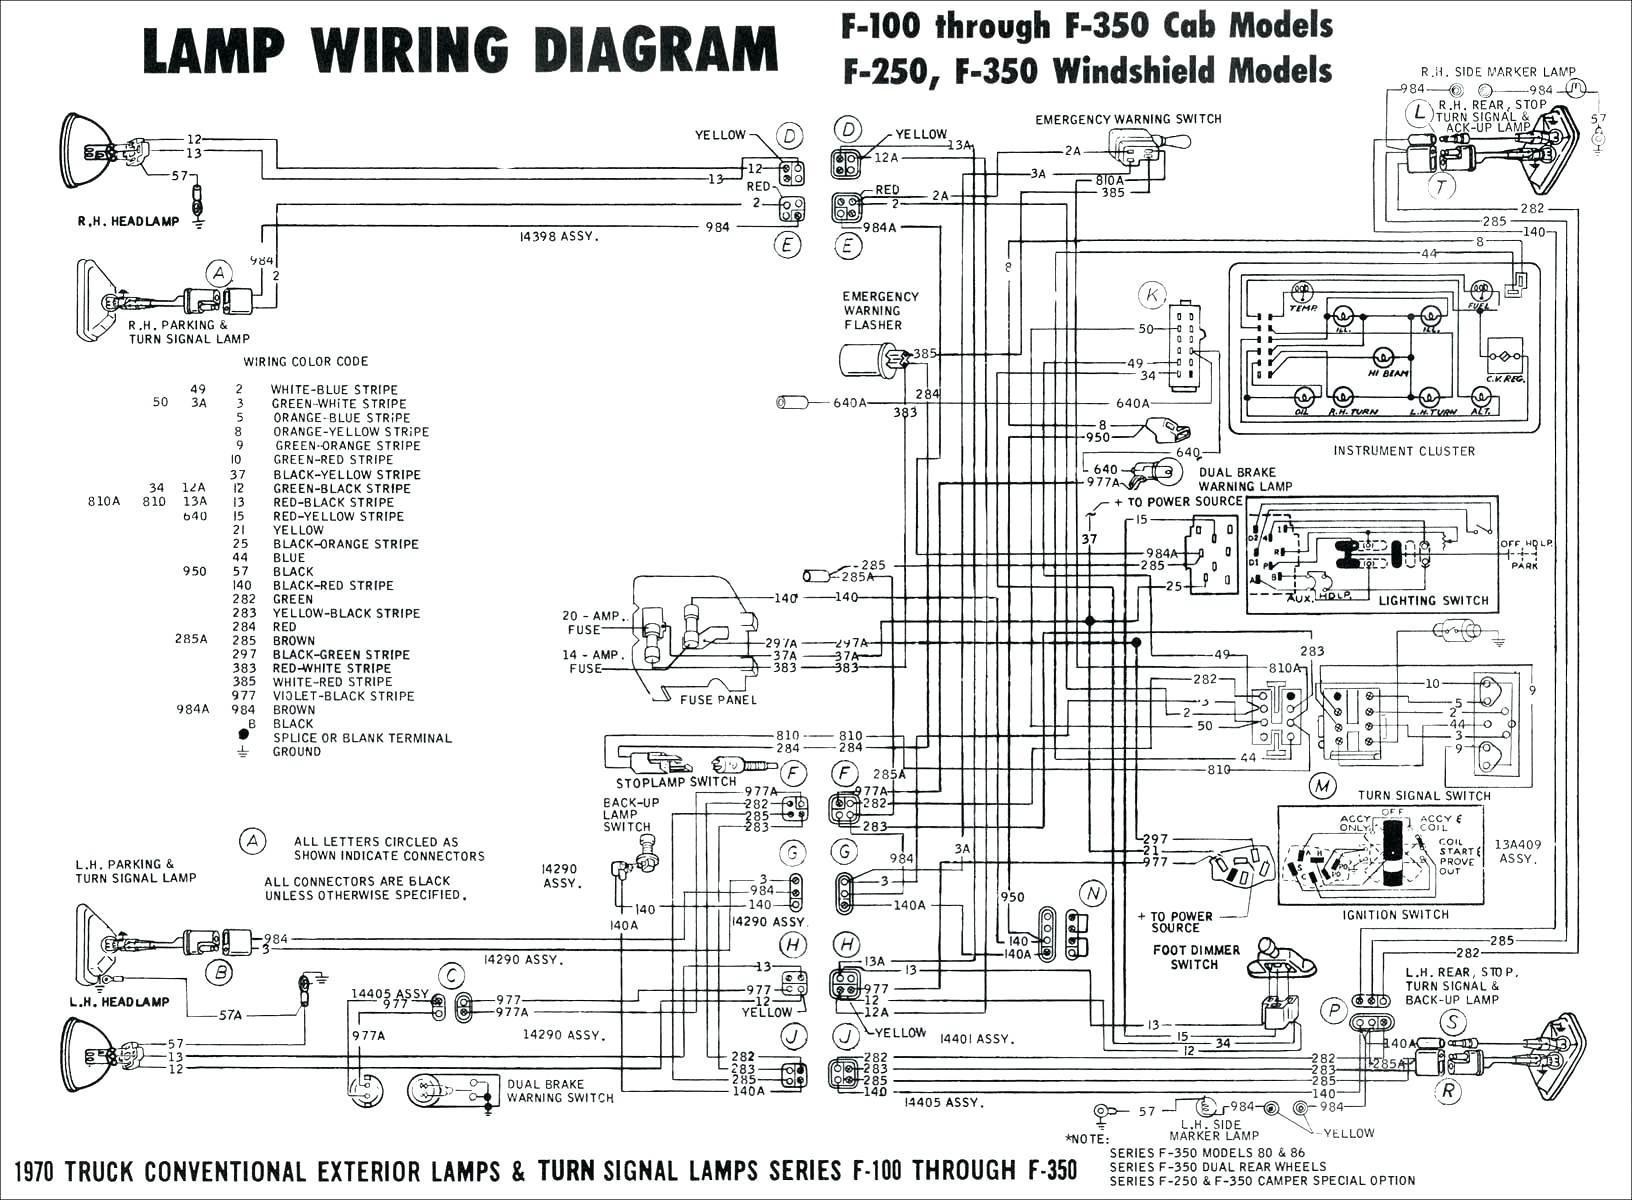 2001 Oldsmobile Aurora Engine Diagram Wiring Diagrams 1998 Aurora V8 Worksheet and Wiring Diagram • Of 2001 Oldsmobile Aurora Engine Diagram